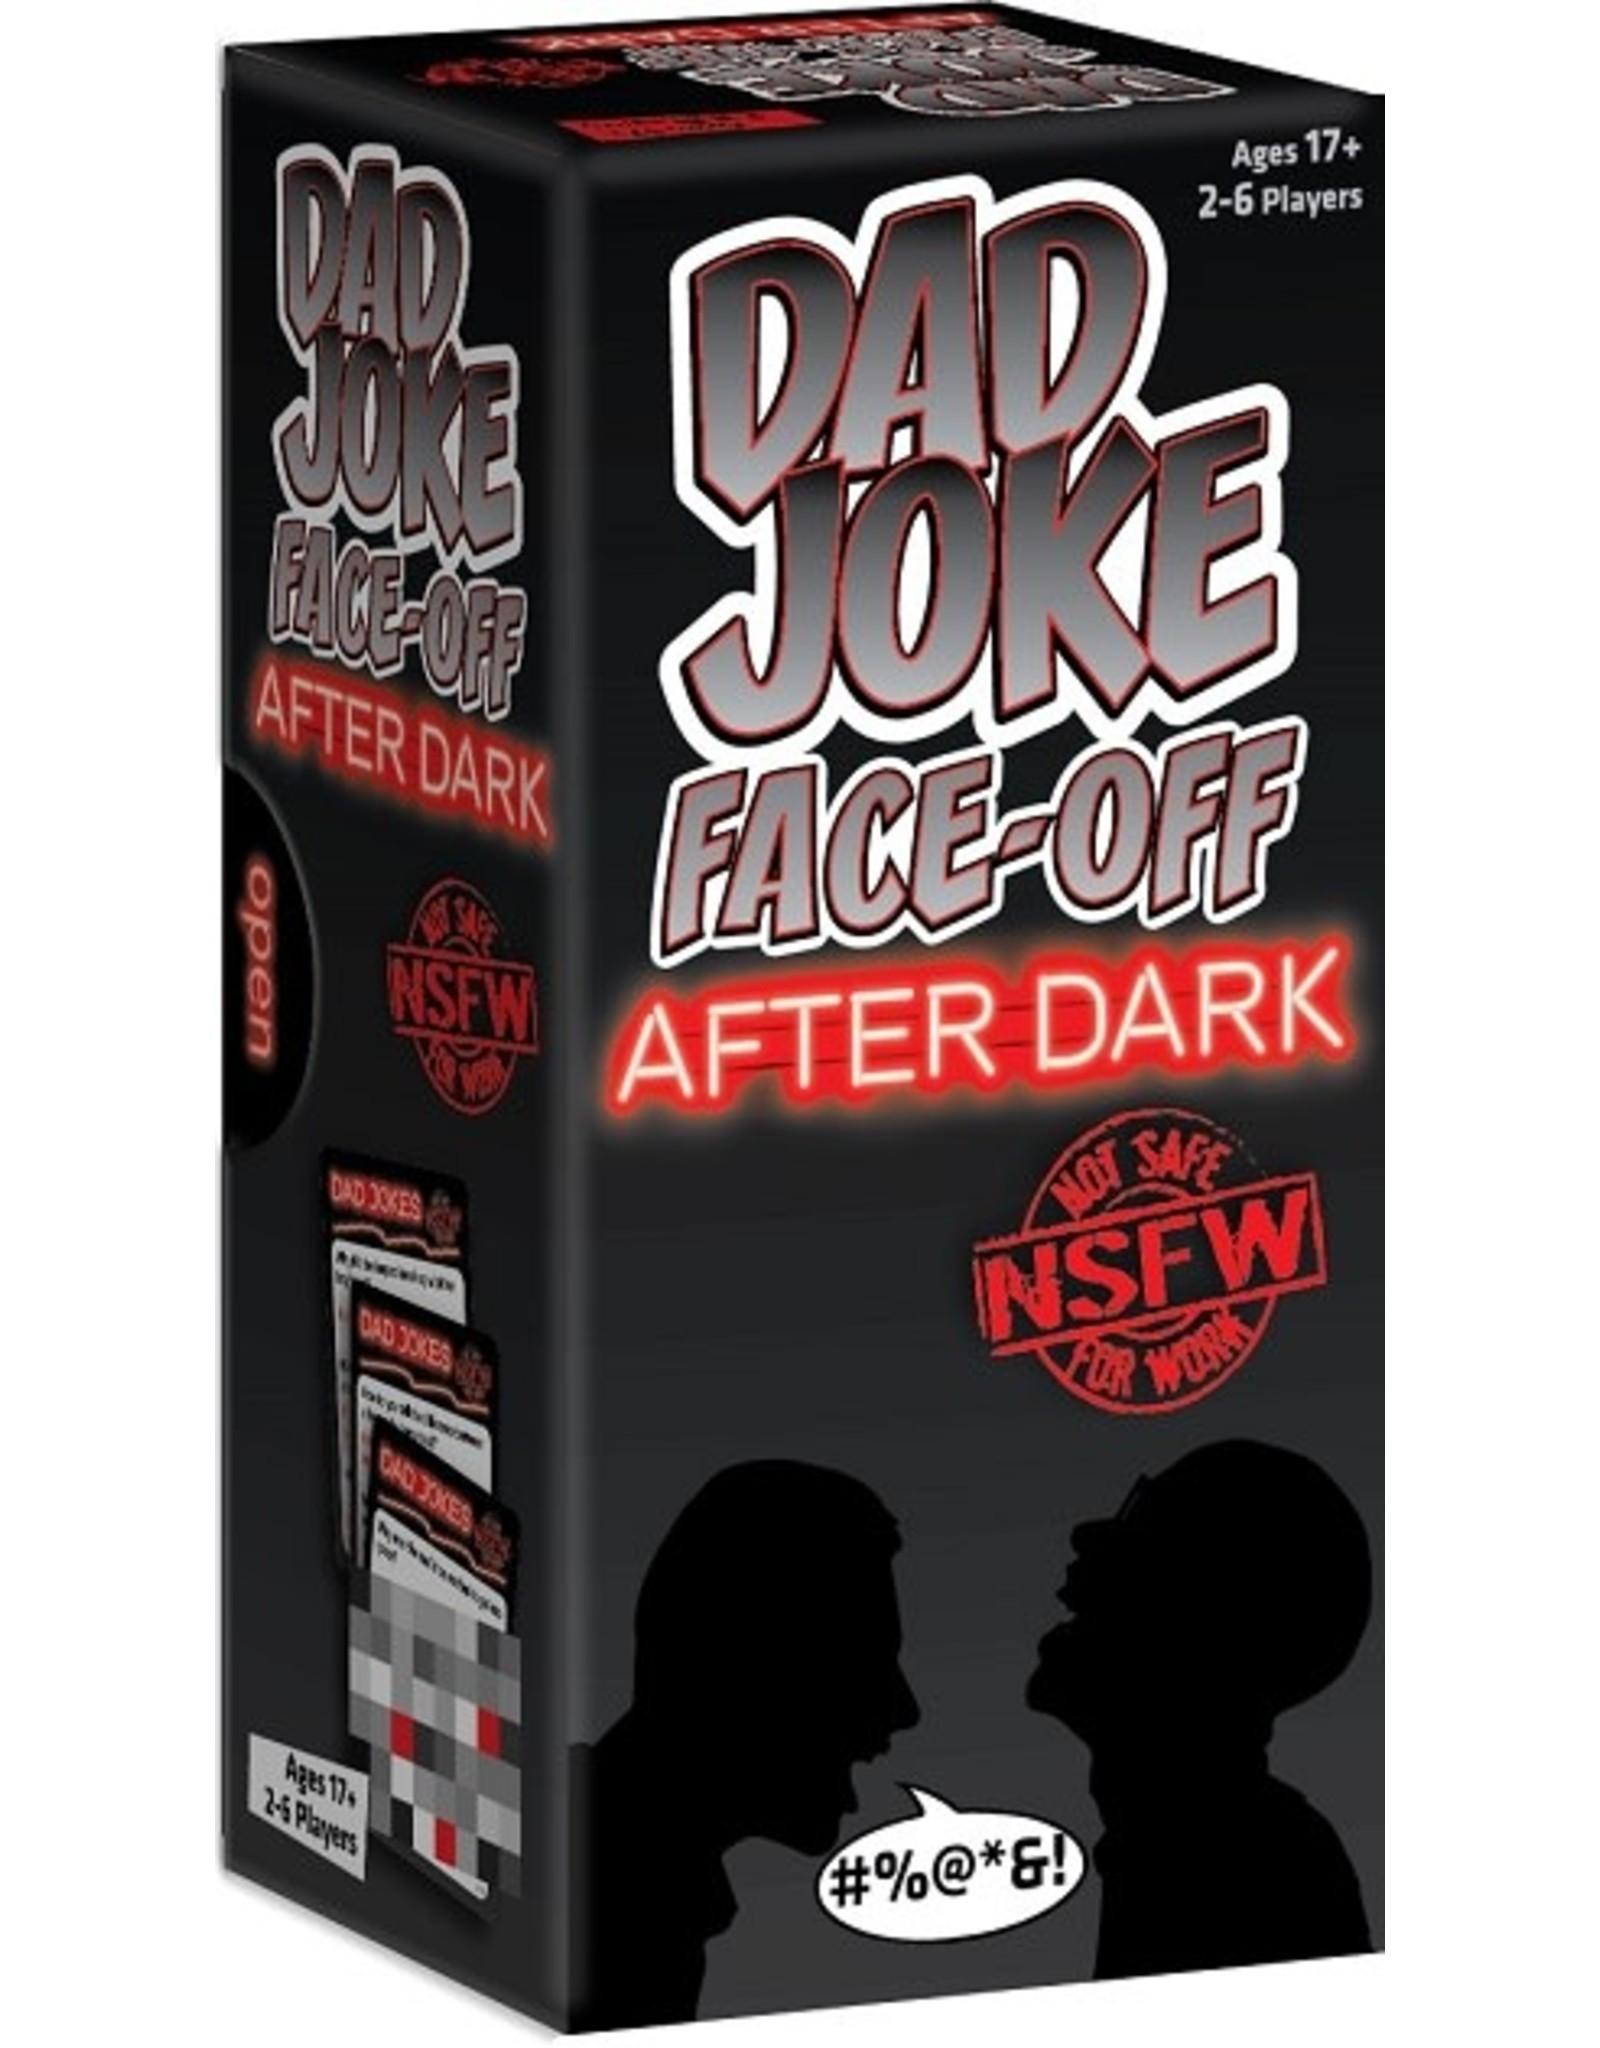 DAD JOKE Face-Off After Dark